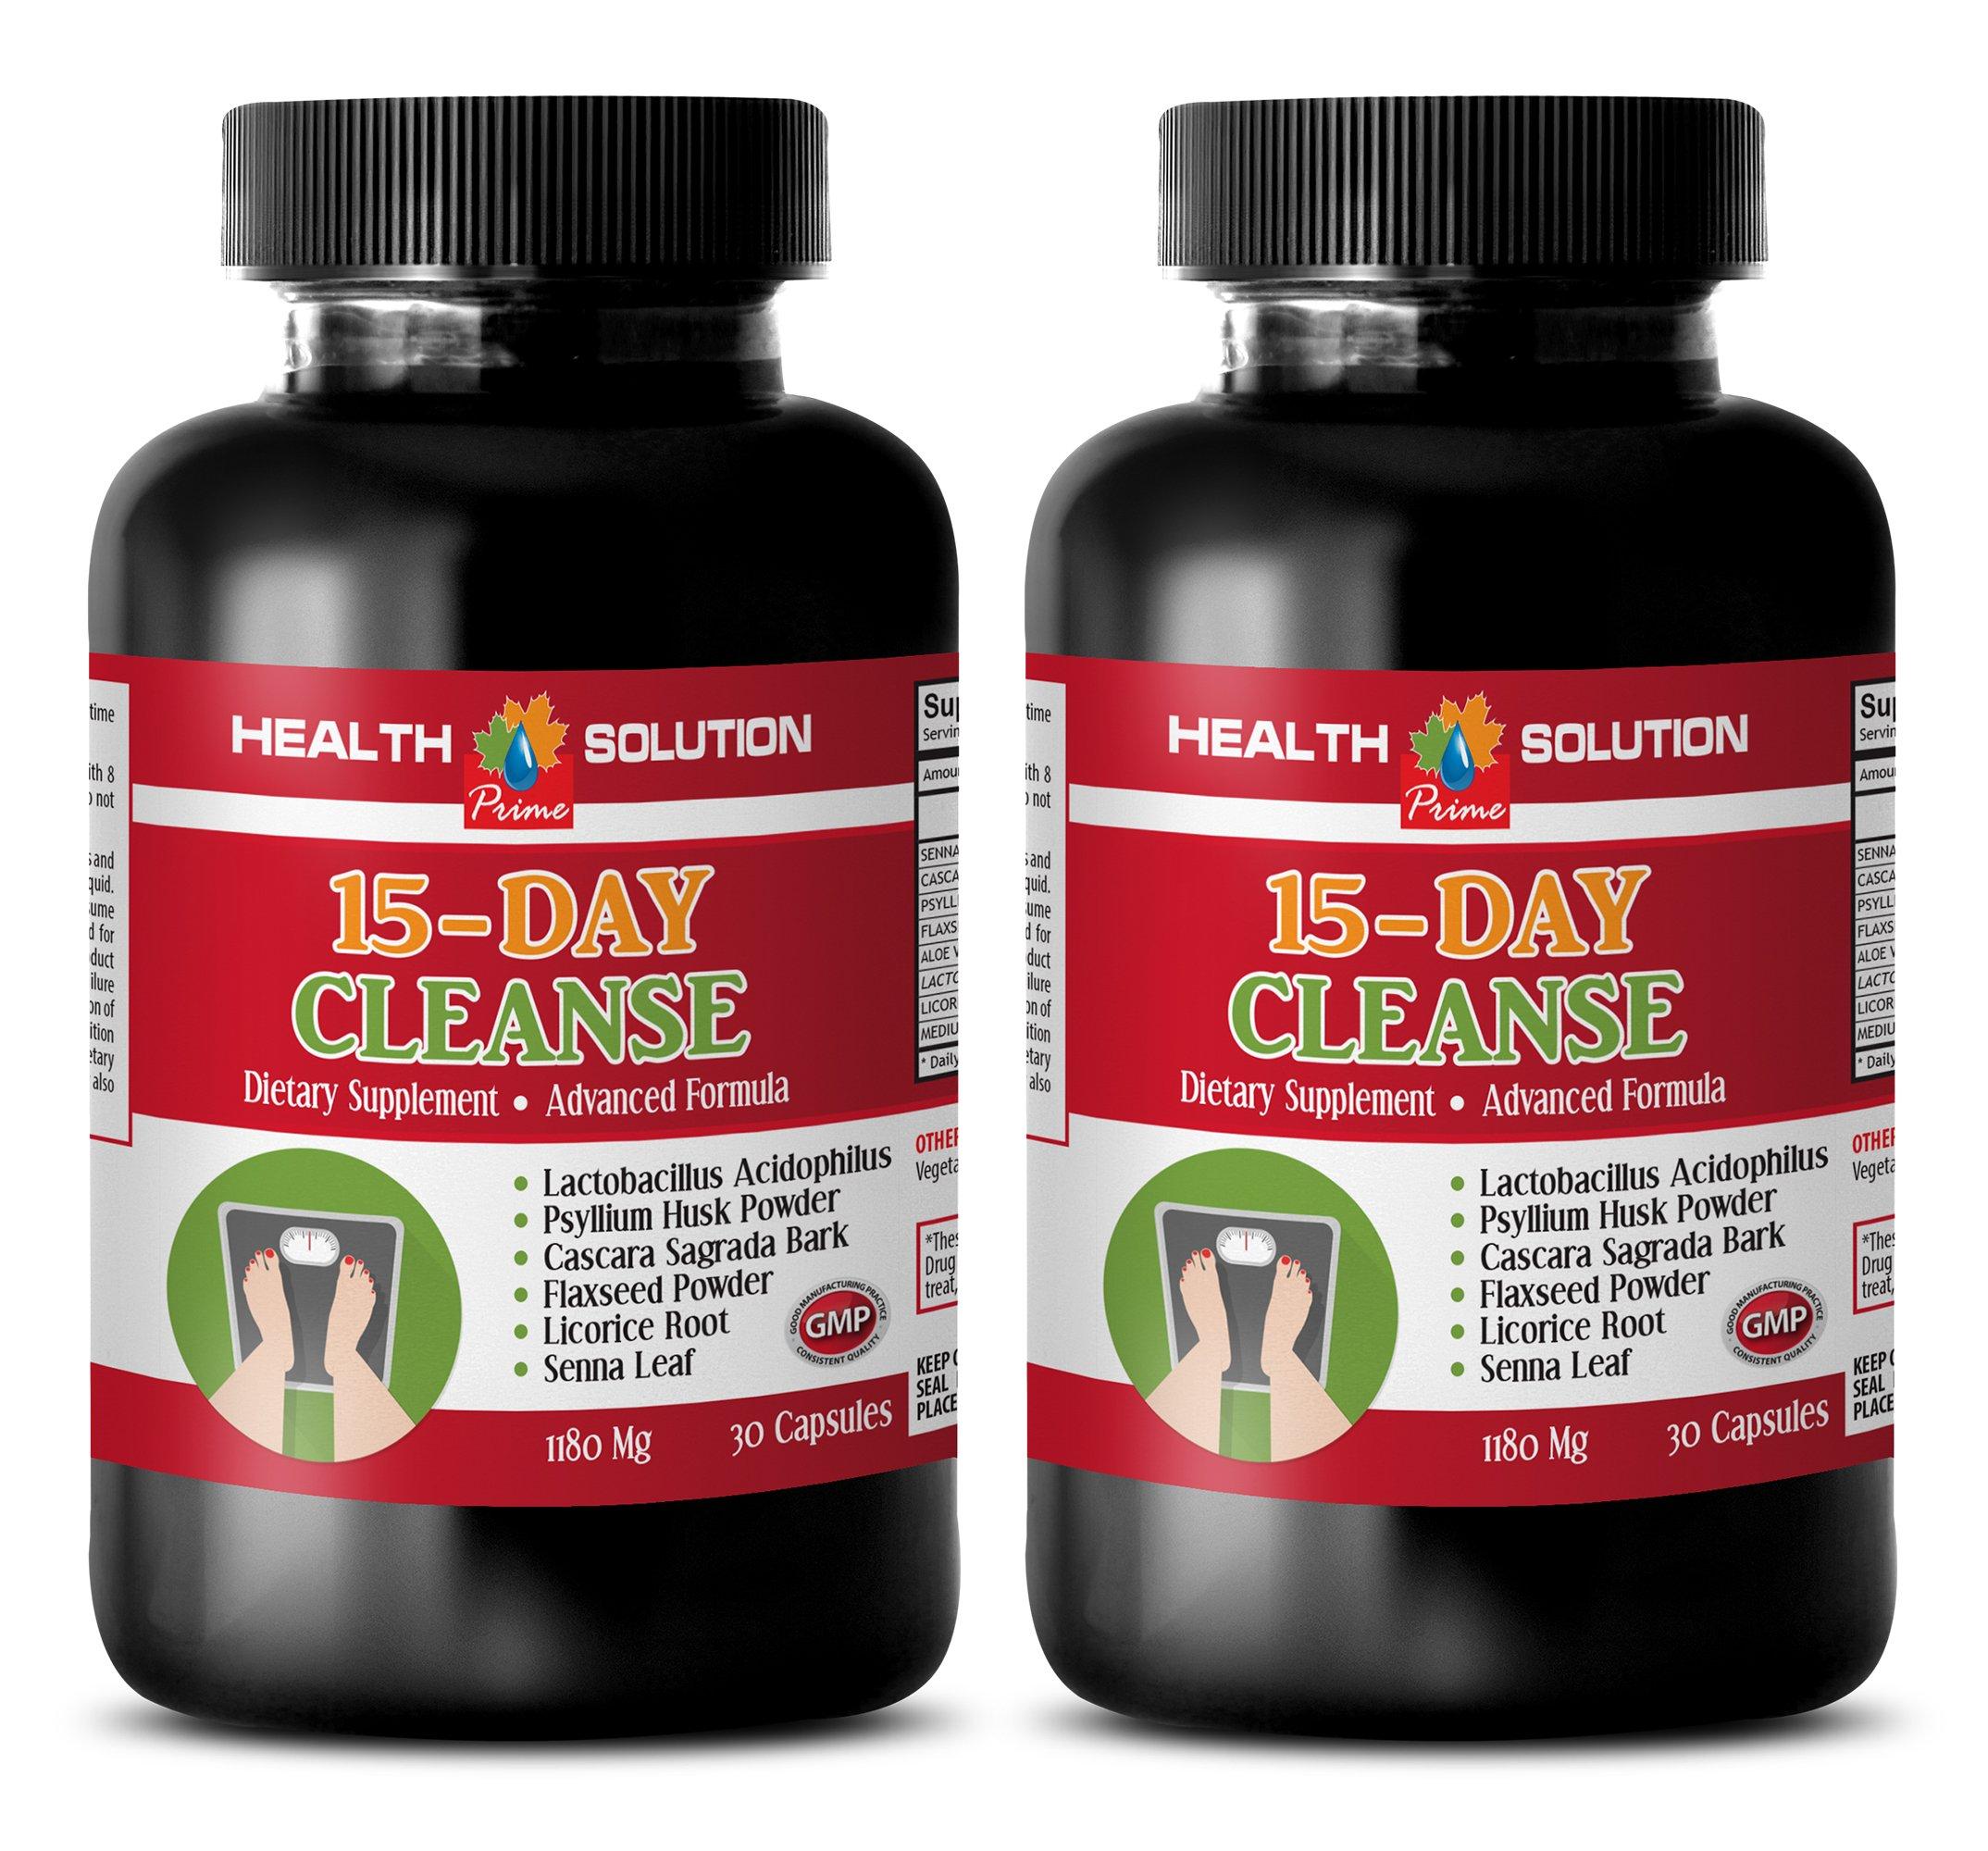 weight loss herbal supplements - 15 DAYS CLEANSE - ADVANCED FORMULA - psyllium husk pills - 2 Bottles 60 Capsules